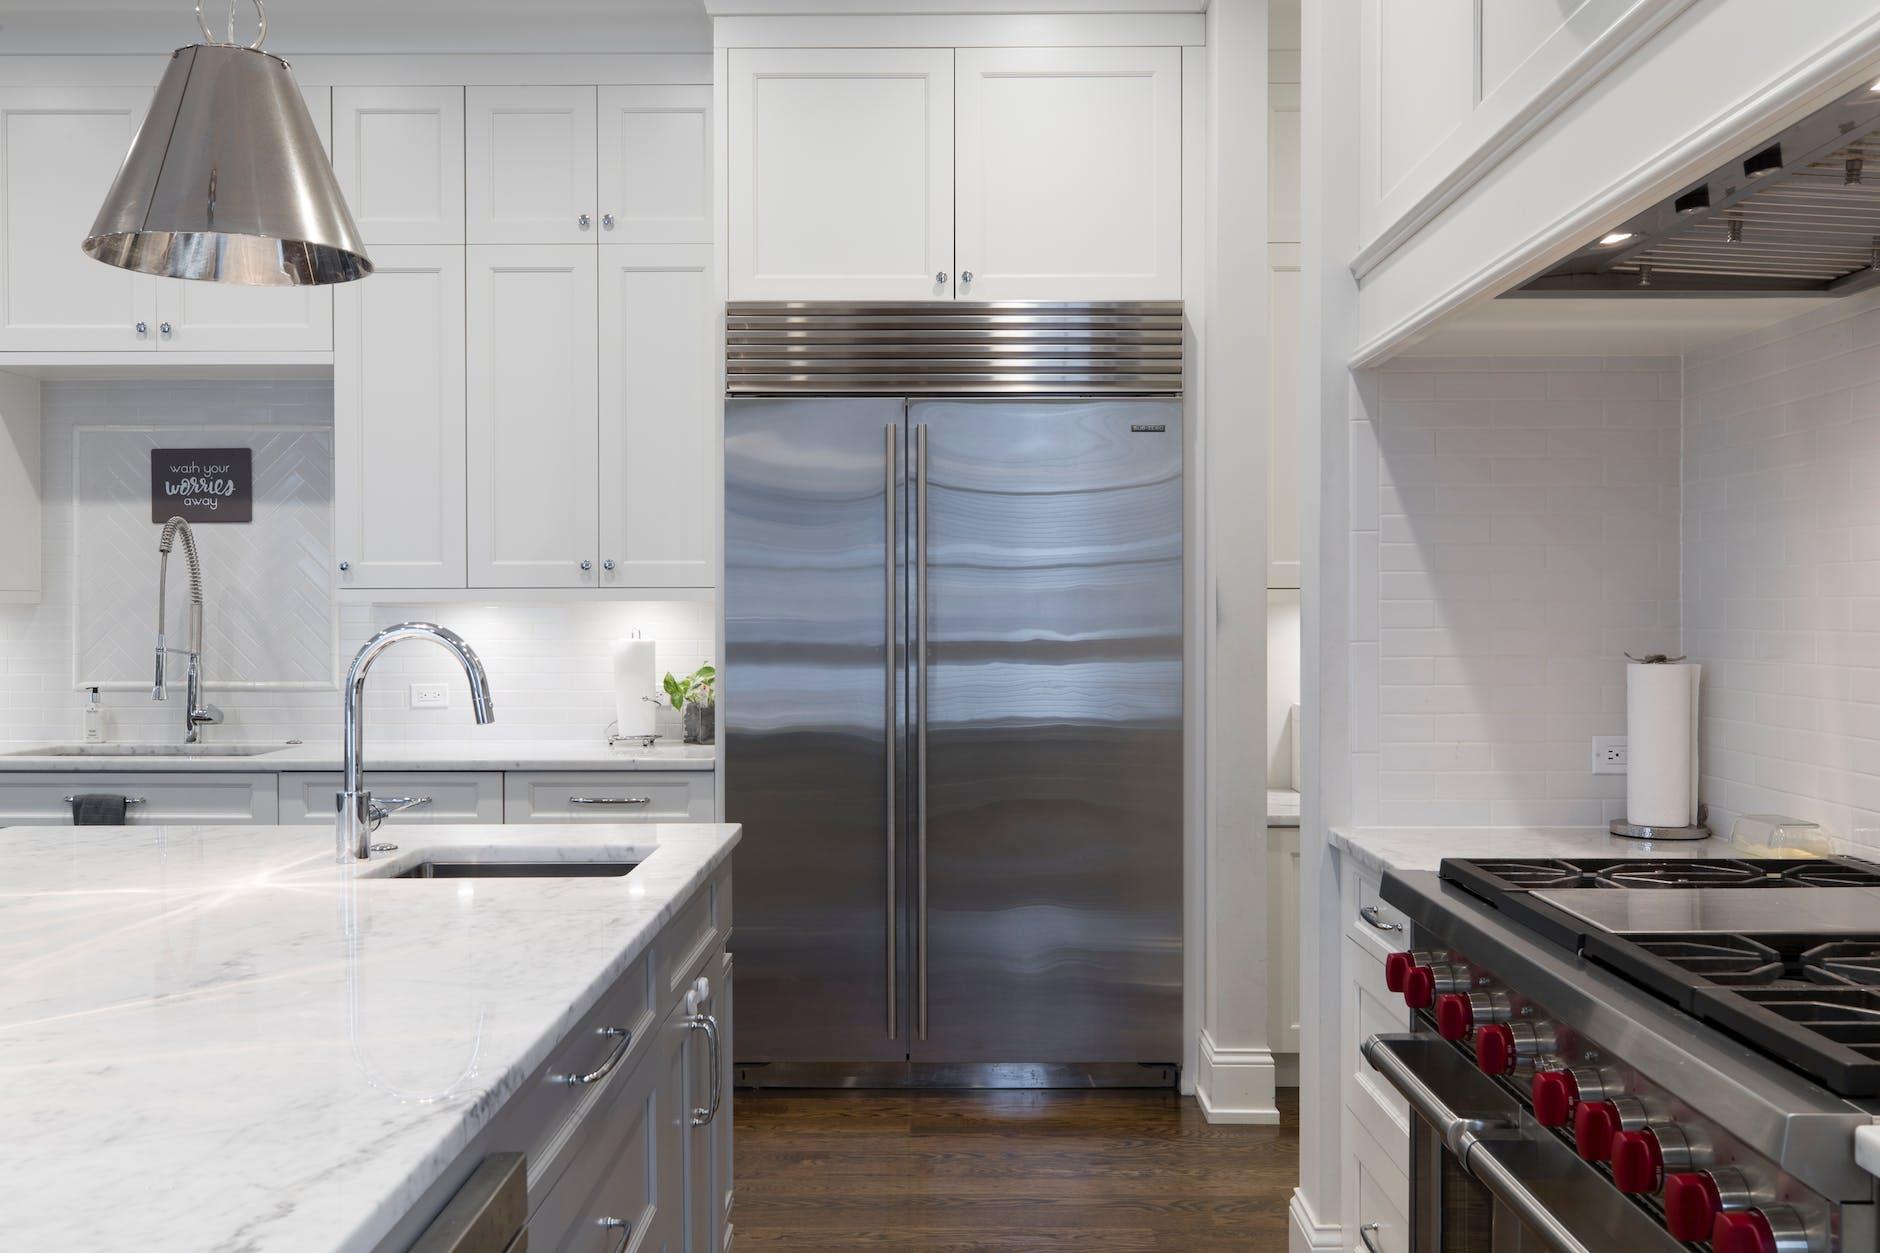 LG vs Whirlpool Refrigerator